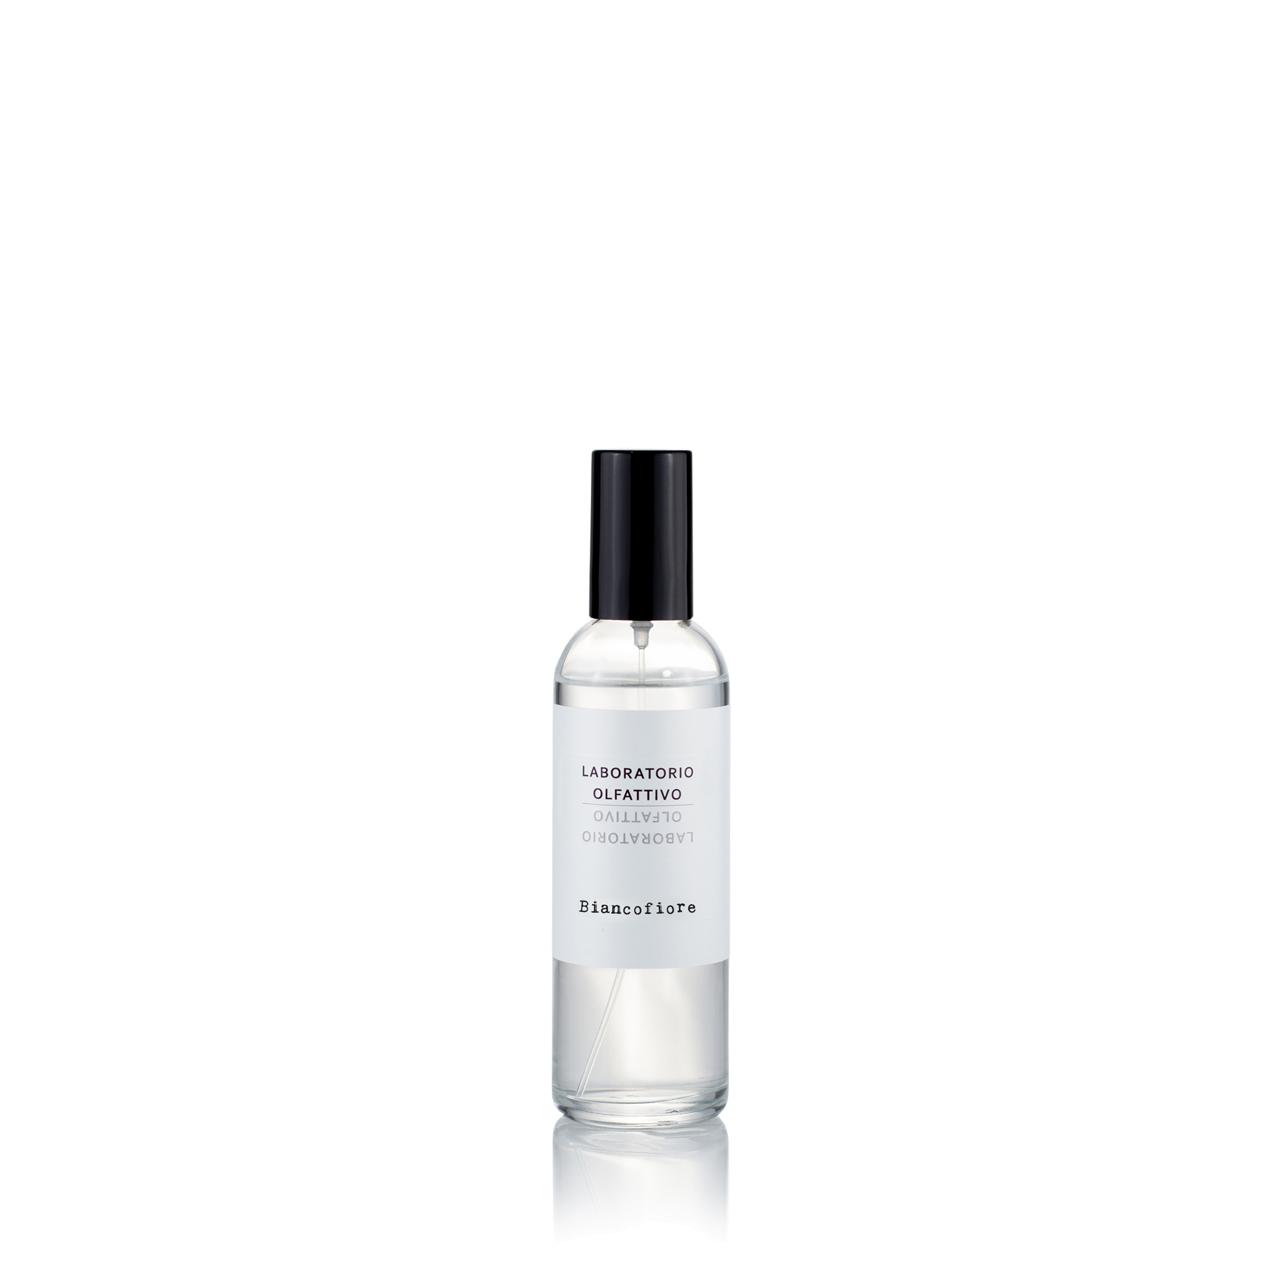 Biancofiore - Room Fragrance